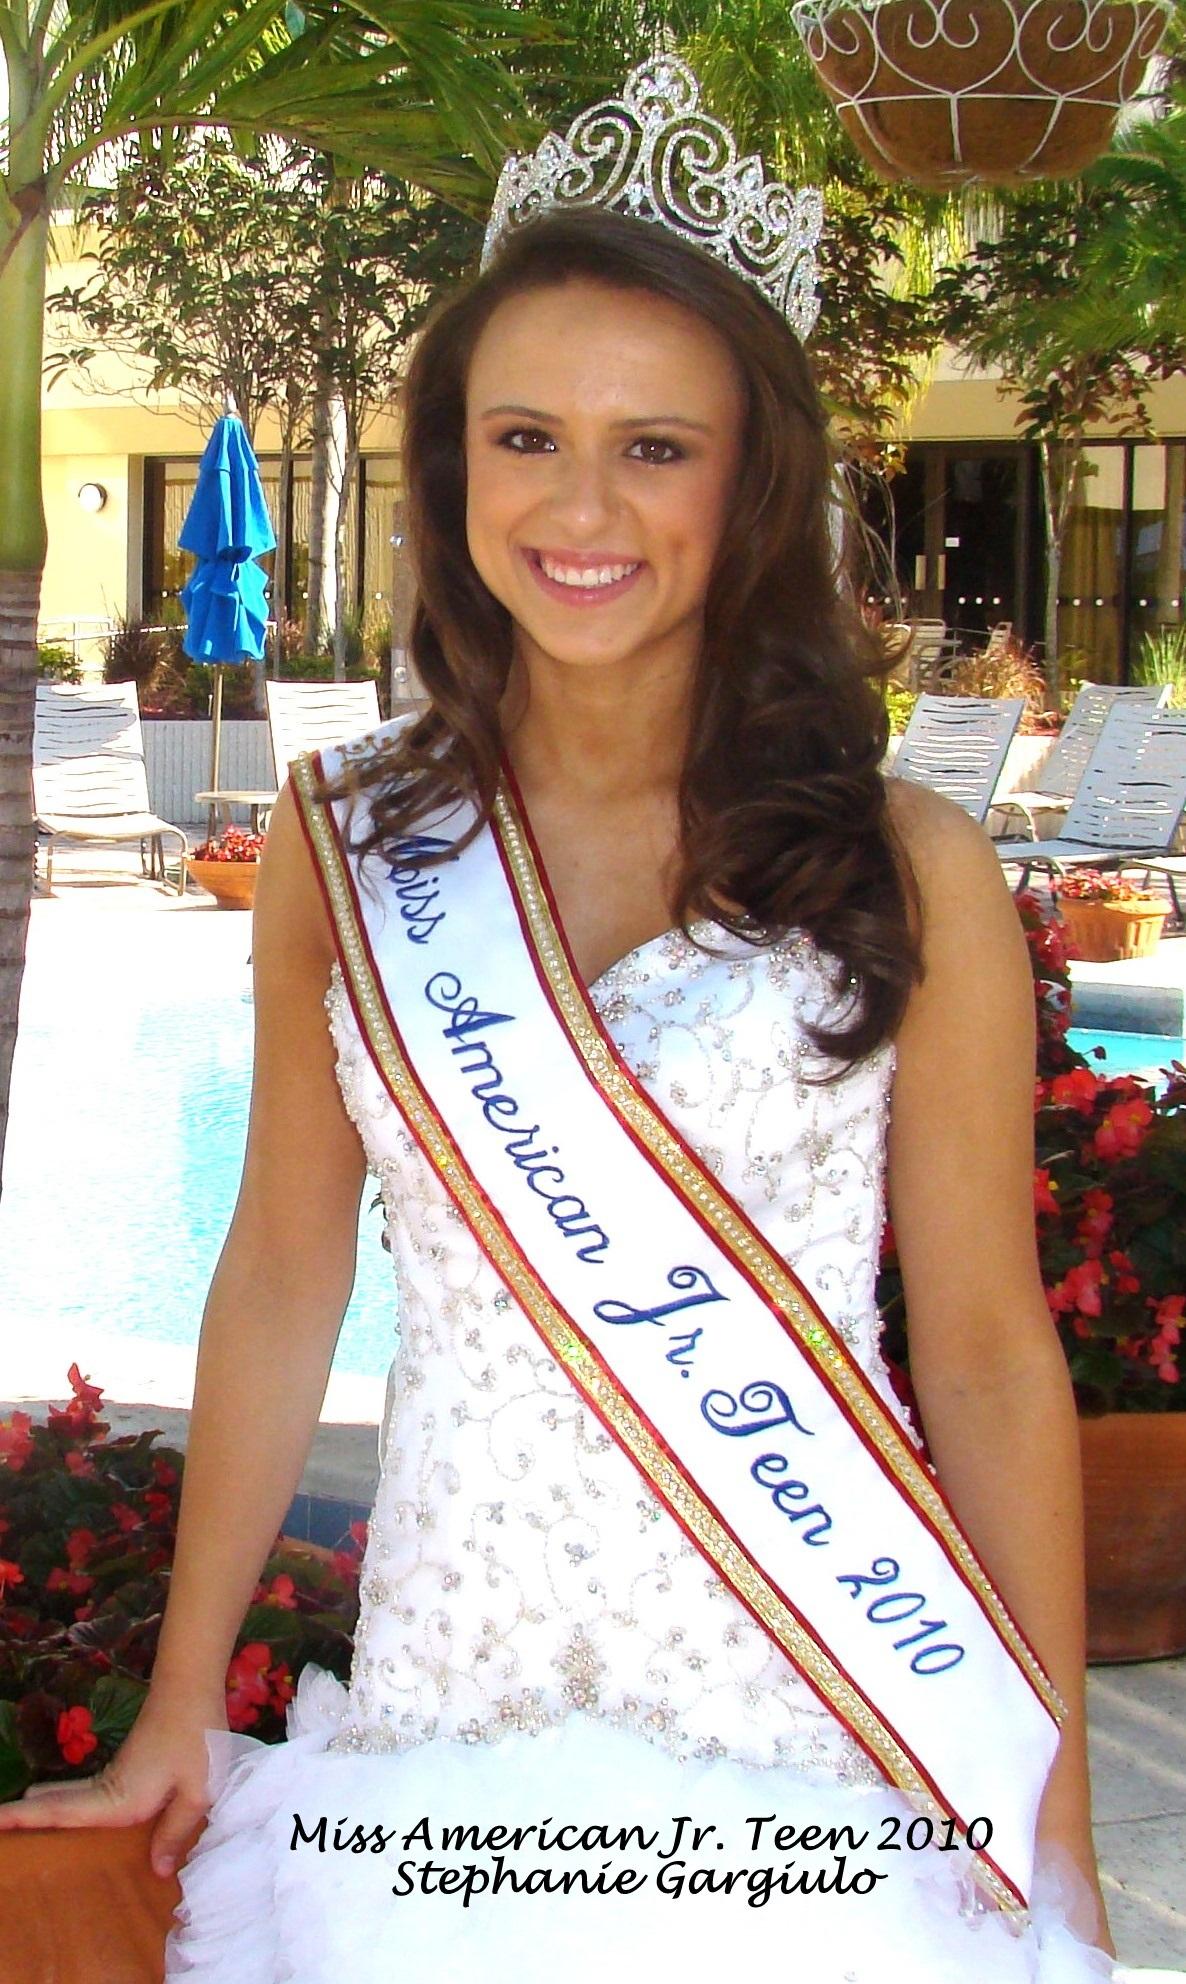 Stephanie Gargiulo